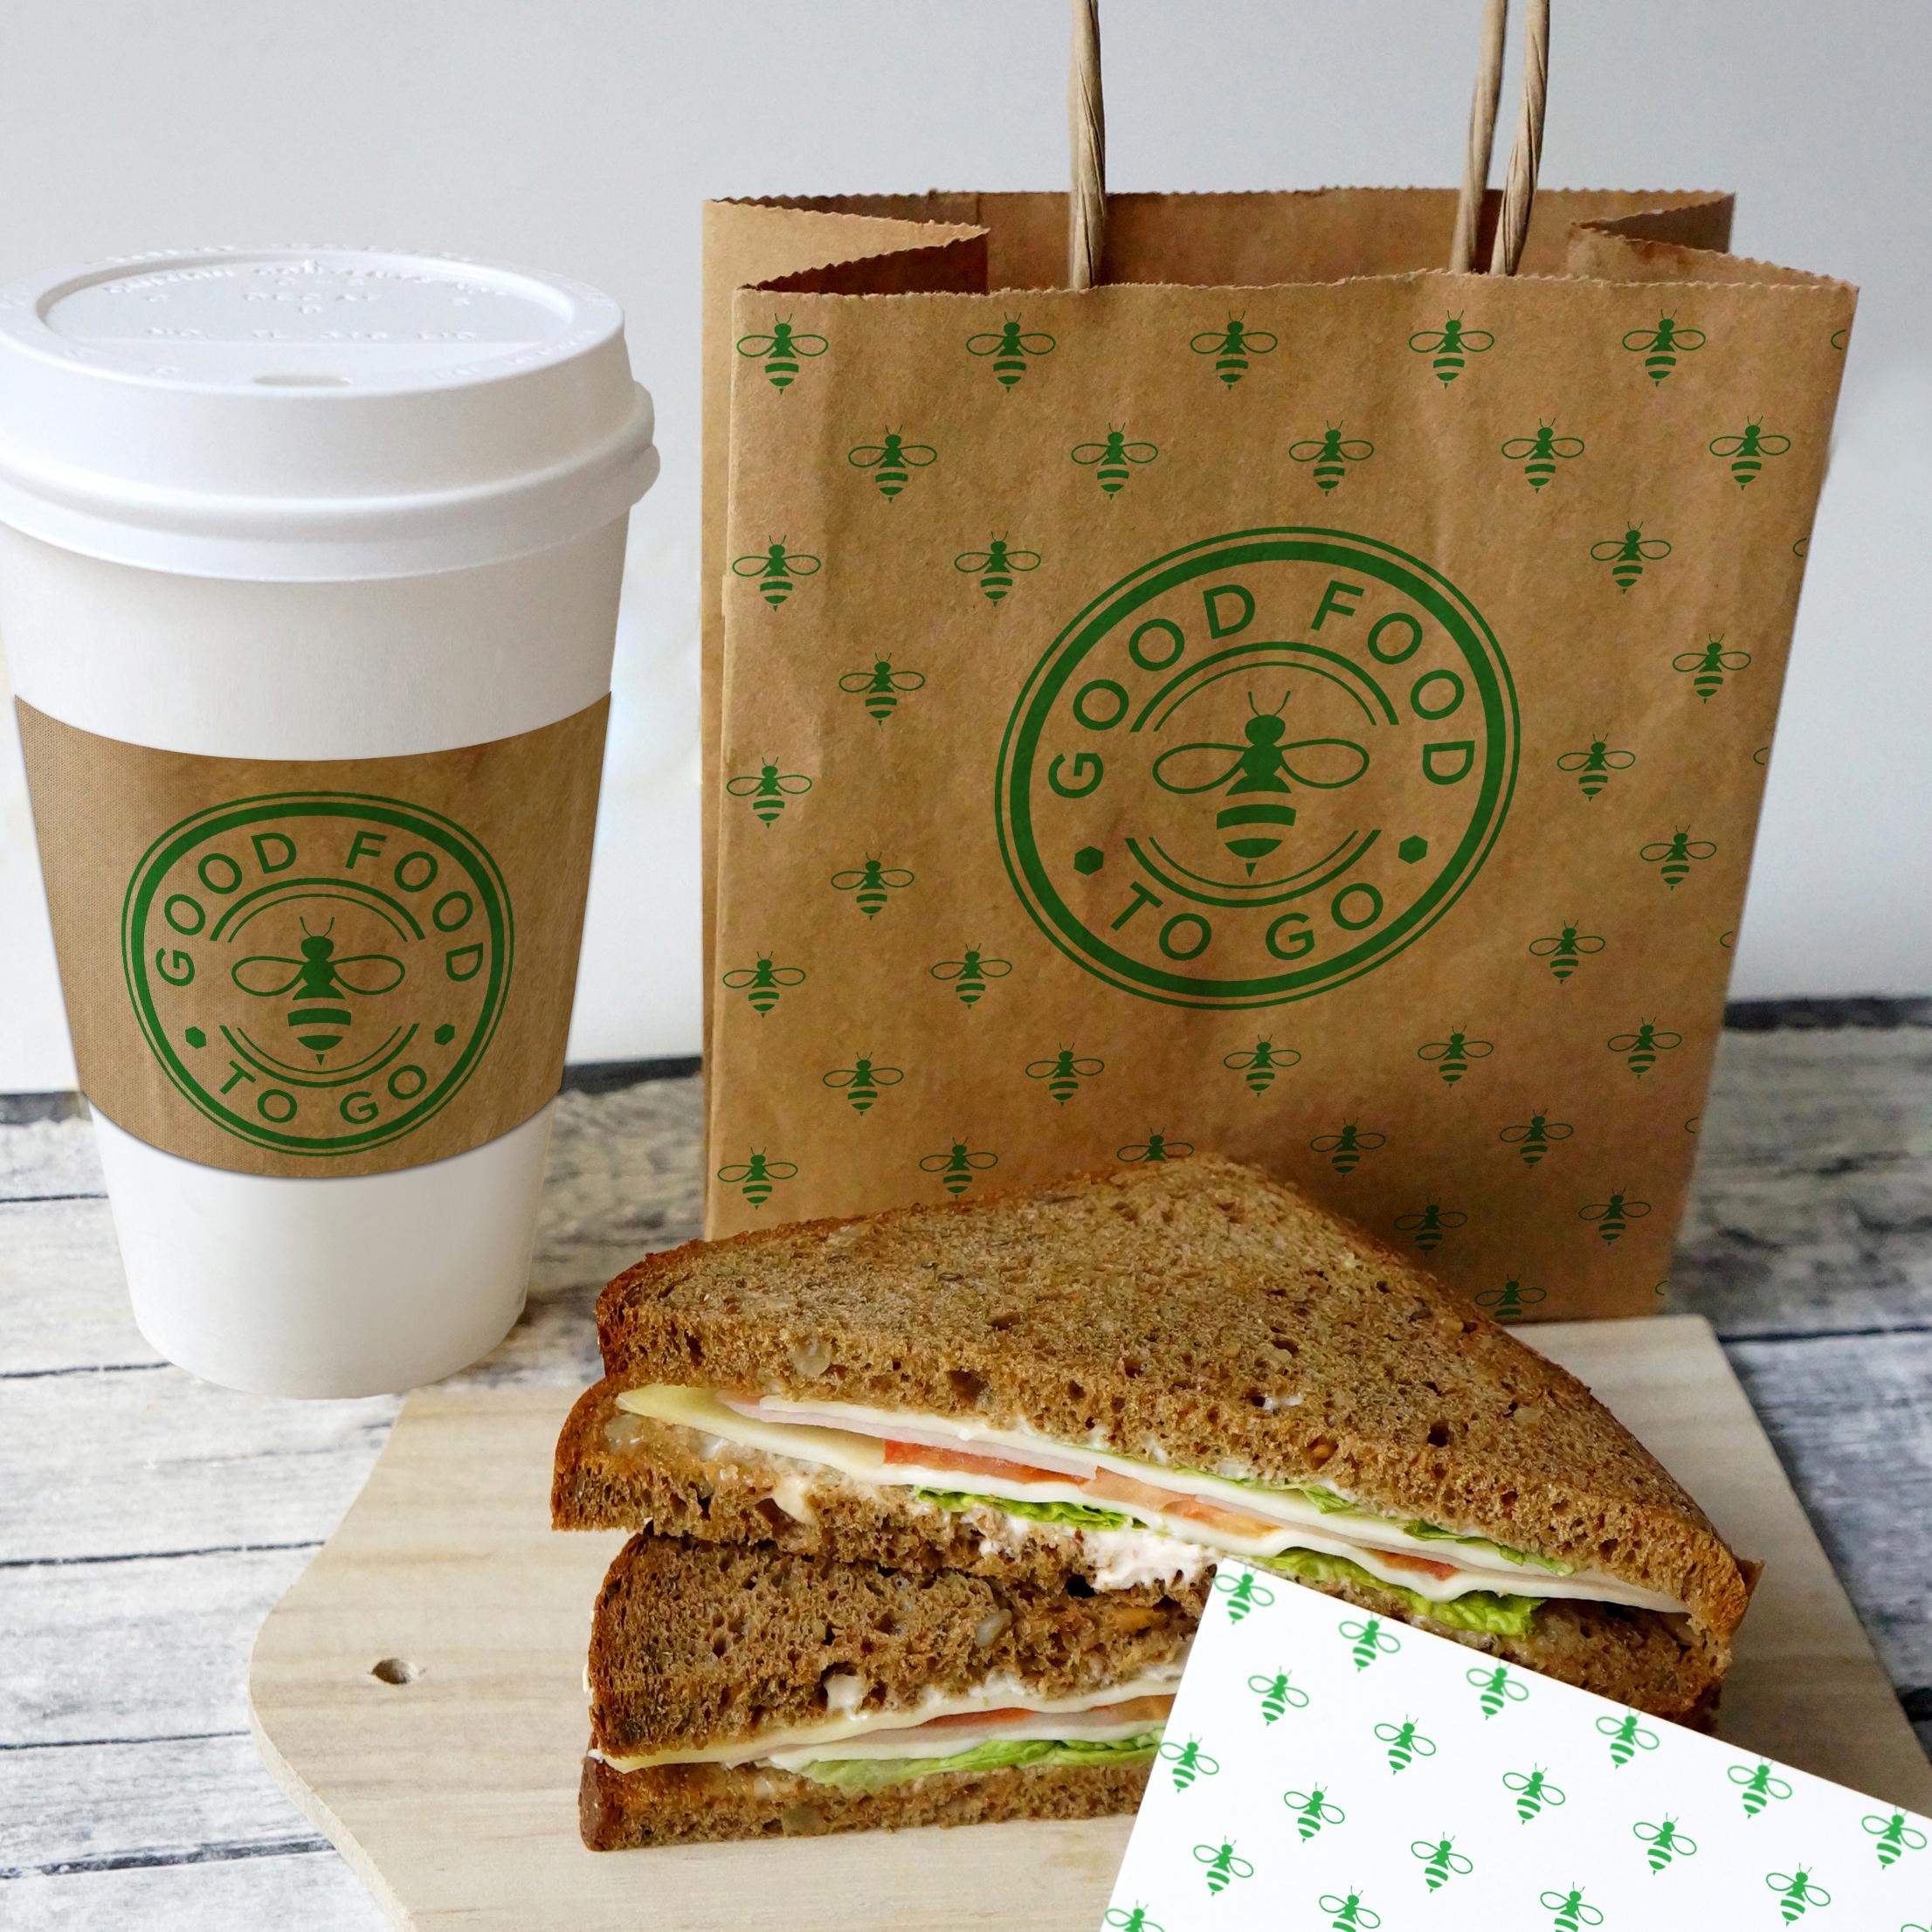 Good-Food-To-Go-Cafe-Marketing-branding-logo-design.jpg